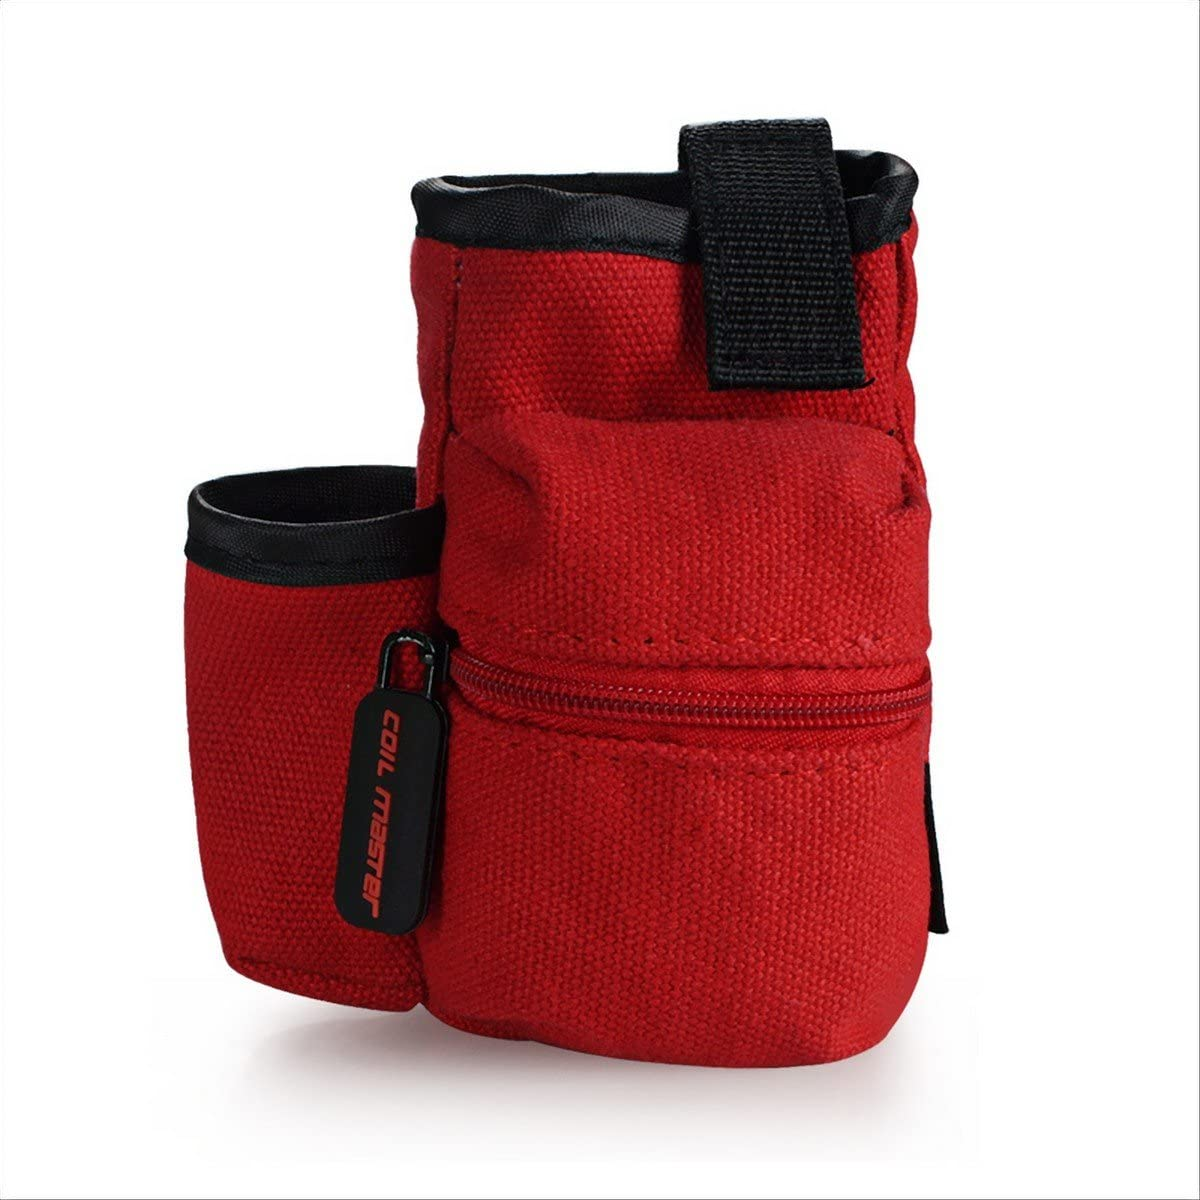 Coil Master Pbag Universal Cigarrillo electrónico Vape Travel Estuche portátil de viaje Mini Vape Bolsa para herramienta [SOLO BOLSA] (Rojo): Amazon.es: Deportes y aire libre